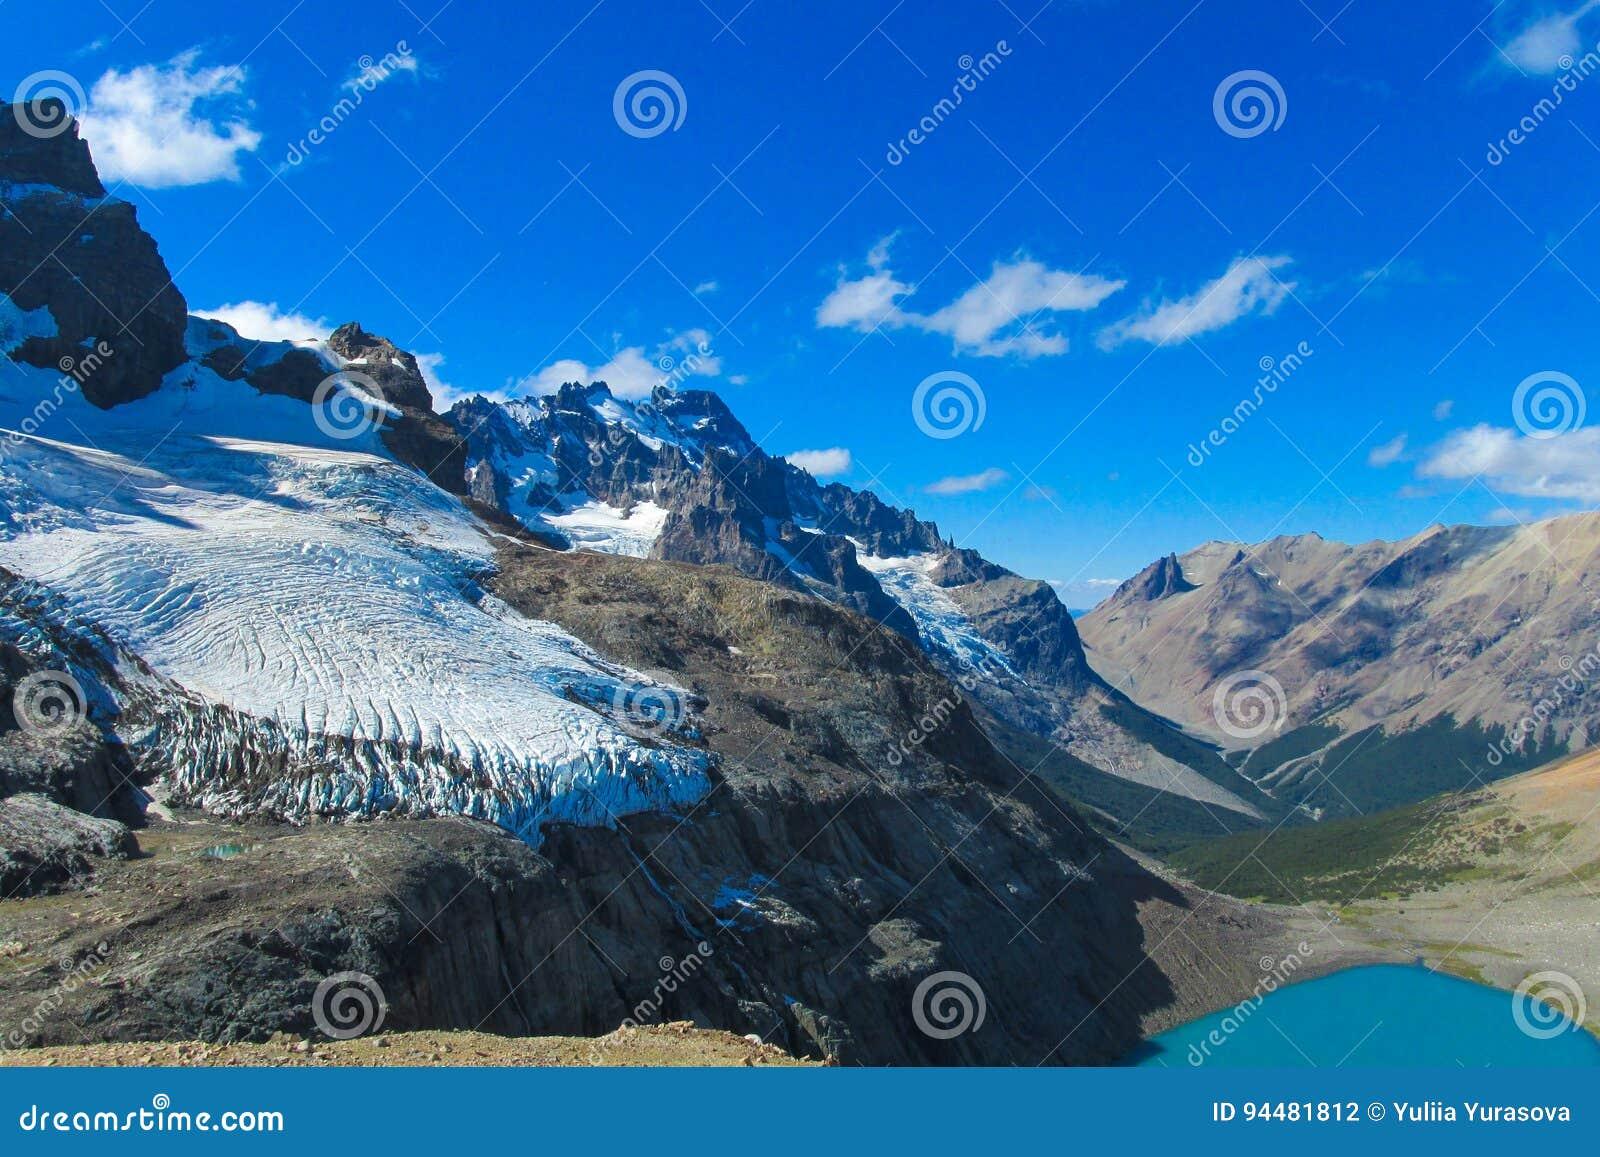 Cerro Castillo range